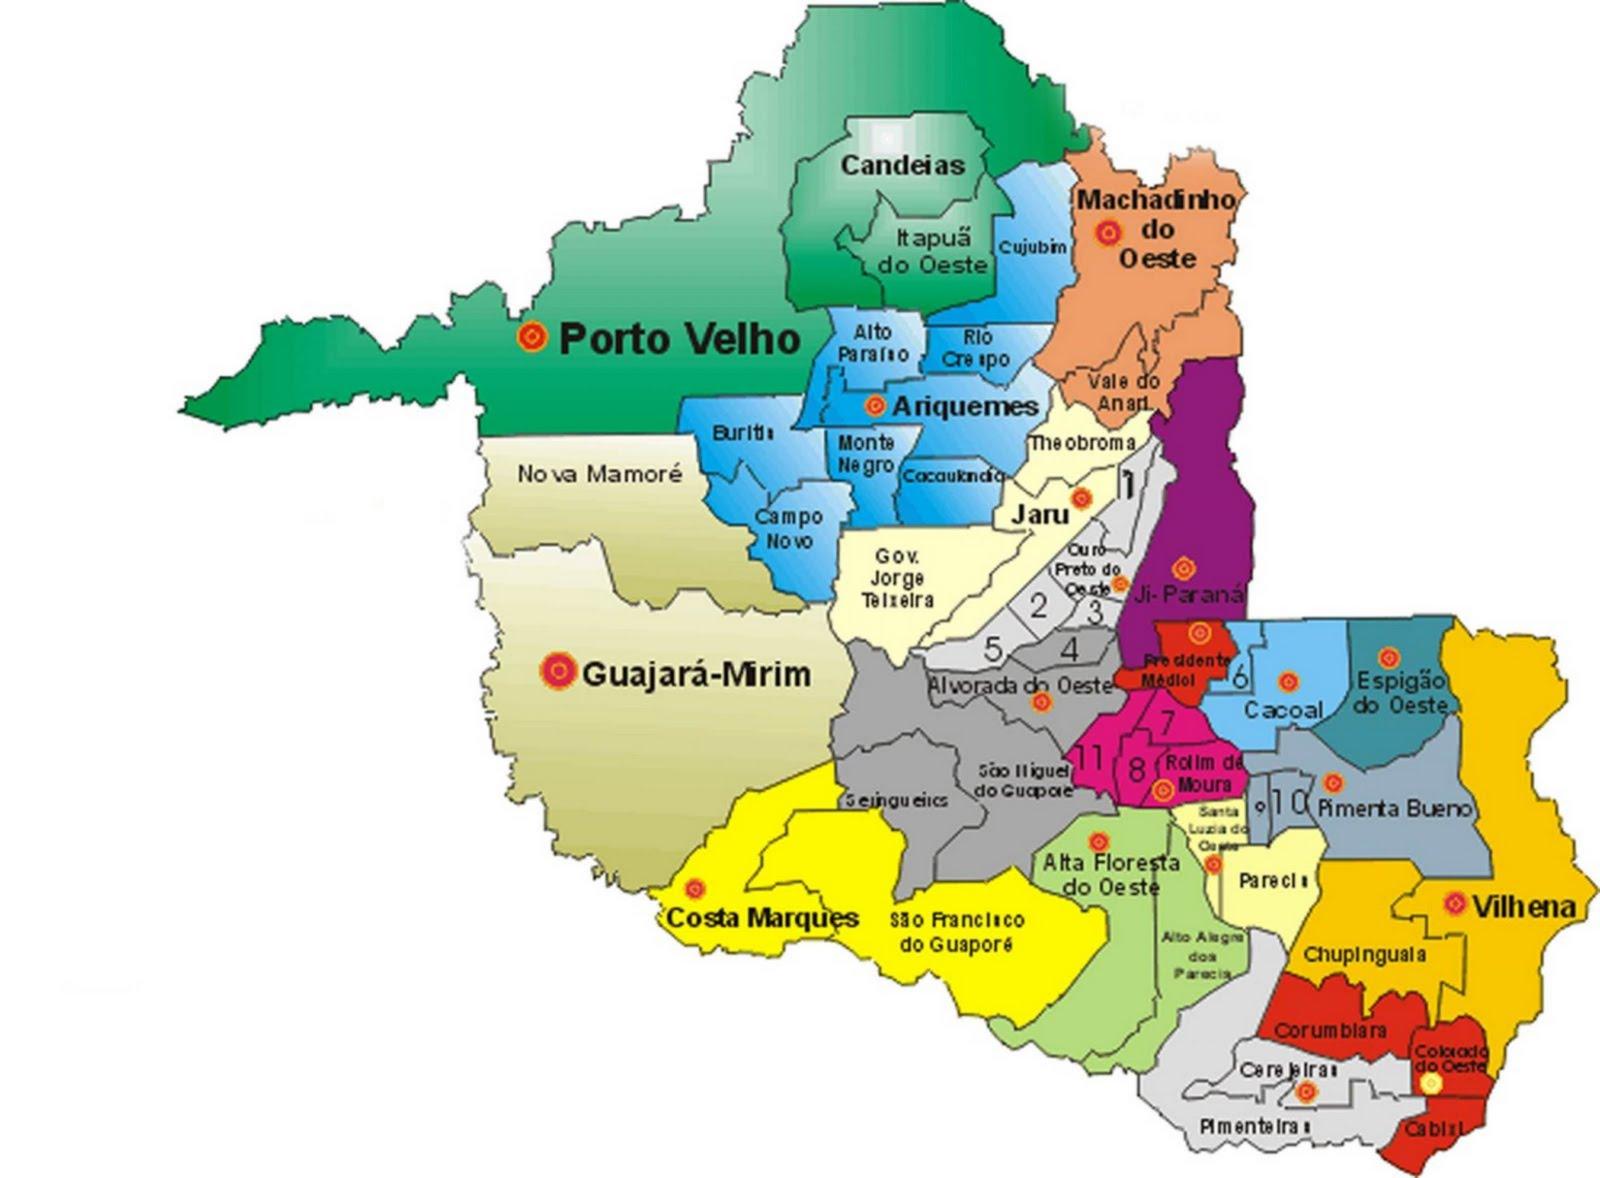 rondonia mapa Mapas de Rondônia | MapasBlog rondonia mapa